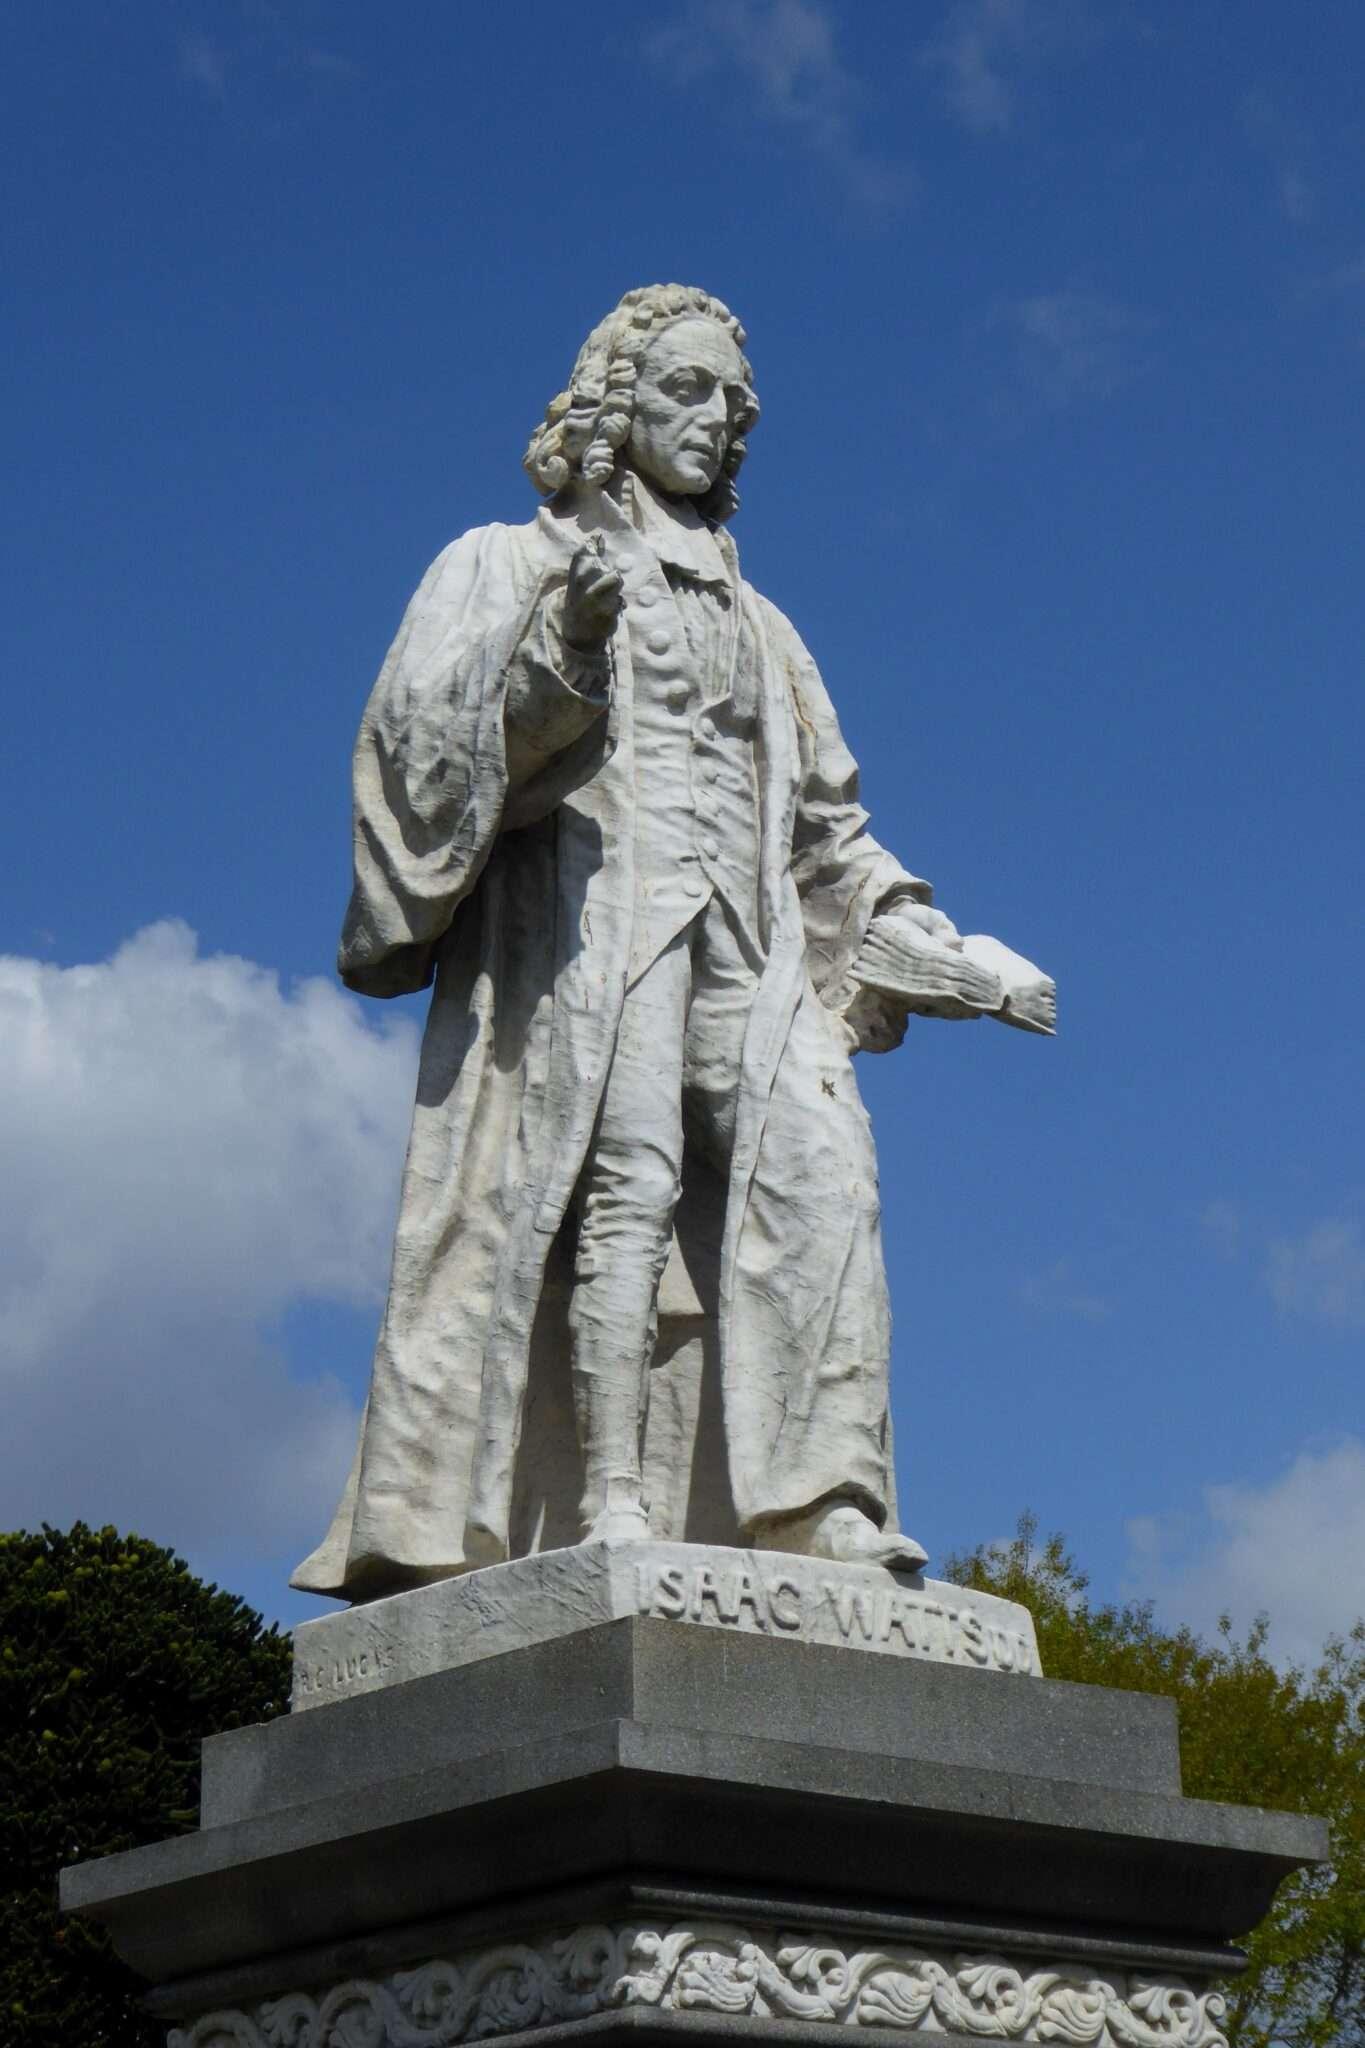 Isaac Watts, Southampton